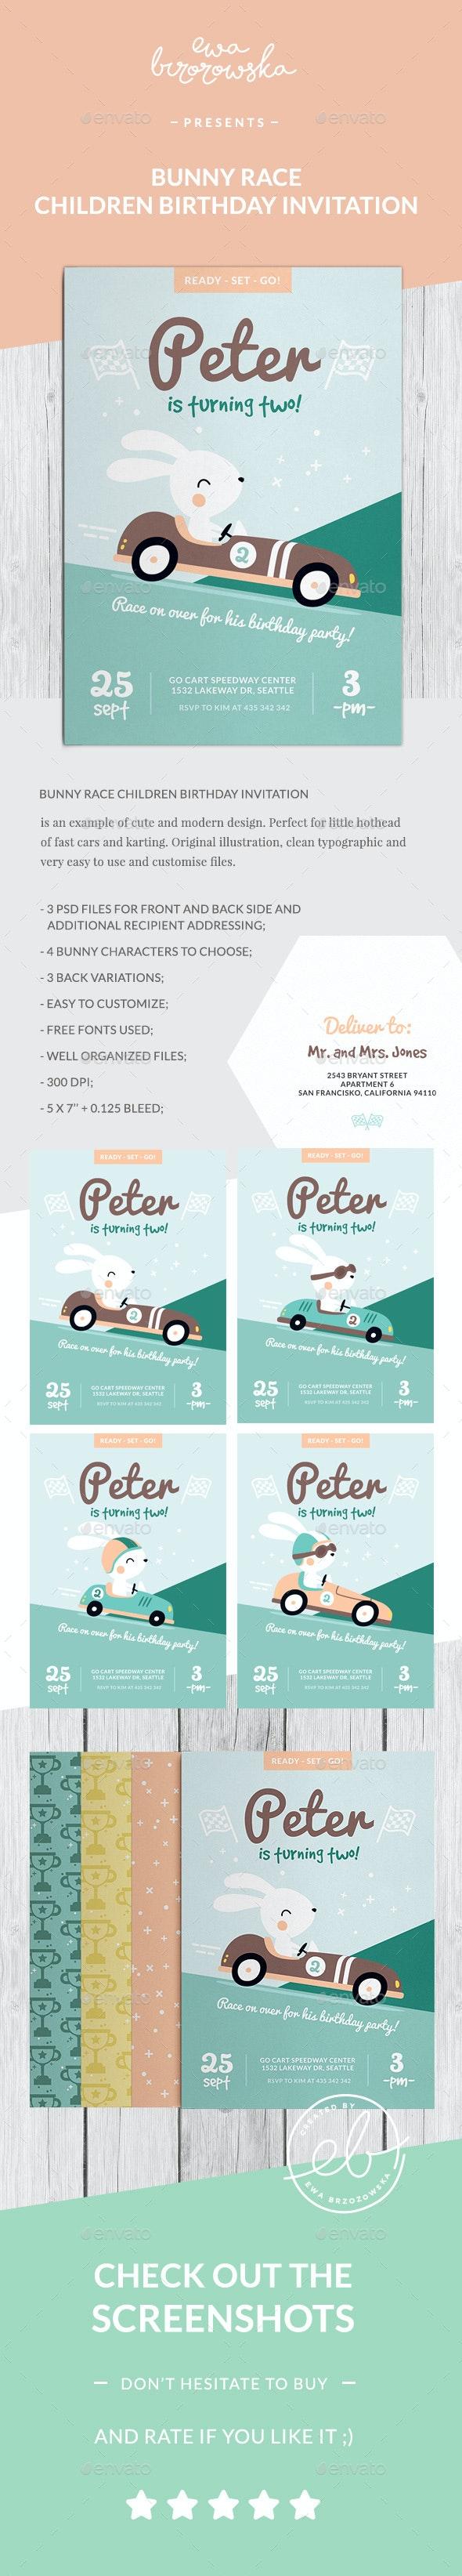 Bunny Race Children Birthday Invitation Card - Invitations Cards & Invites